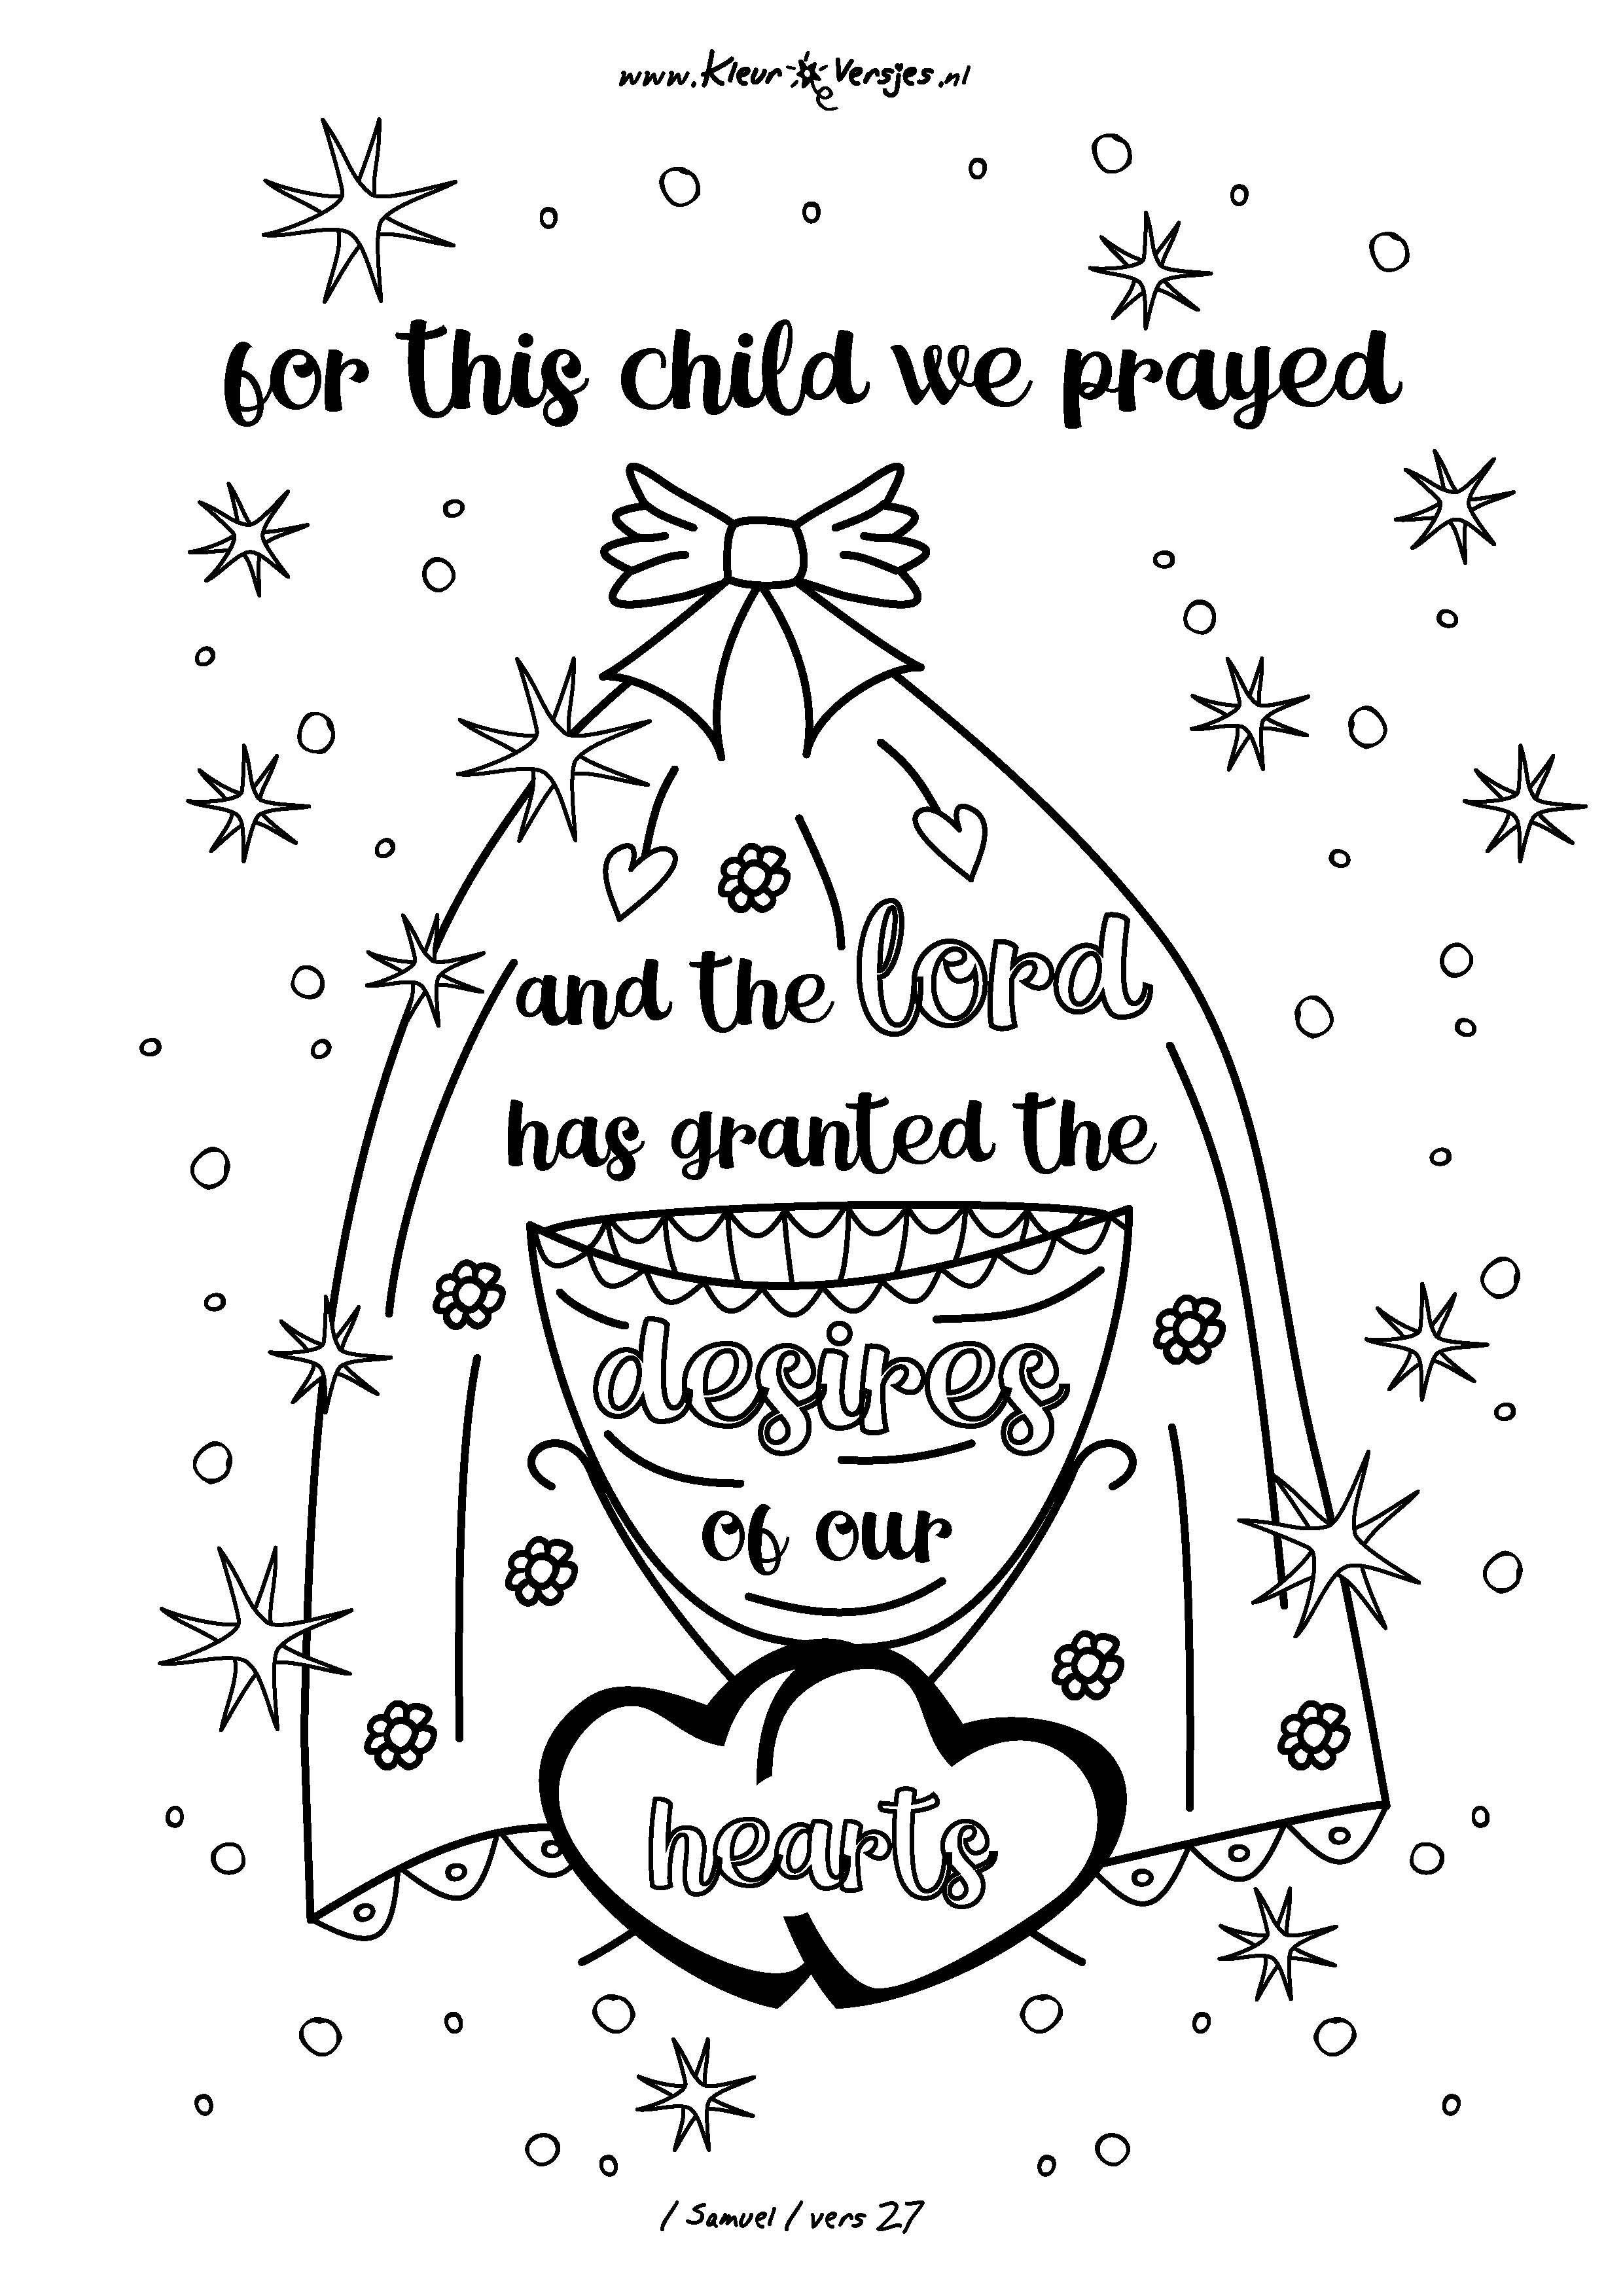 Christelijke Kleurplaten Advent 014 For This Child We Prayed Kleurversjes Nl